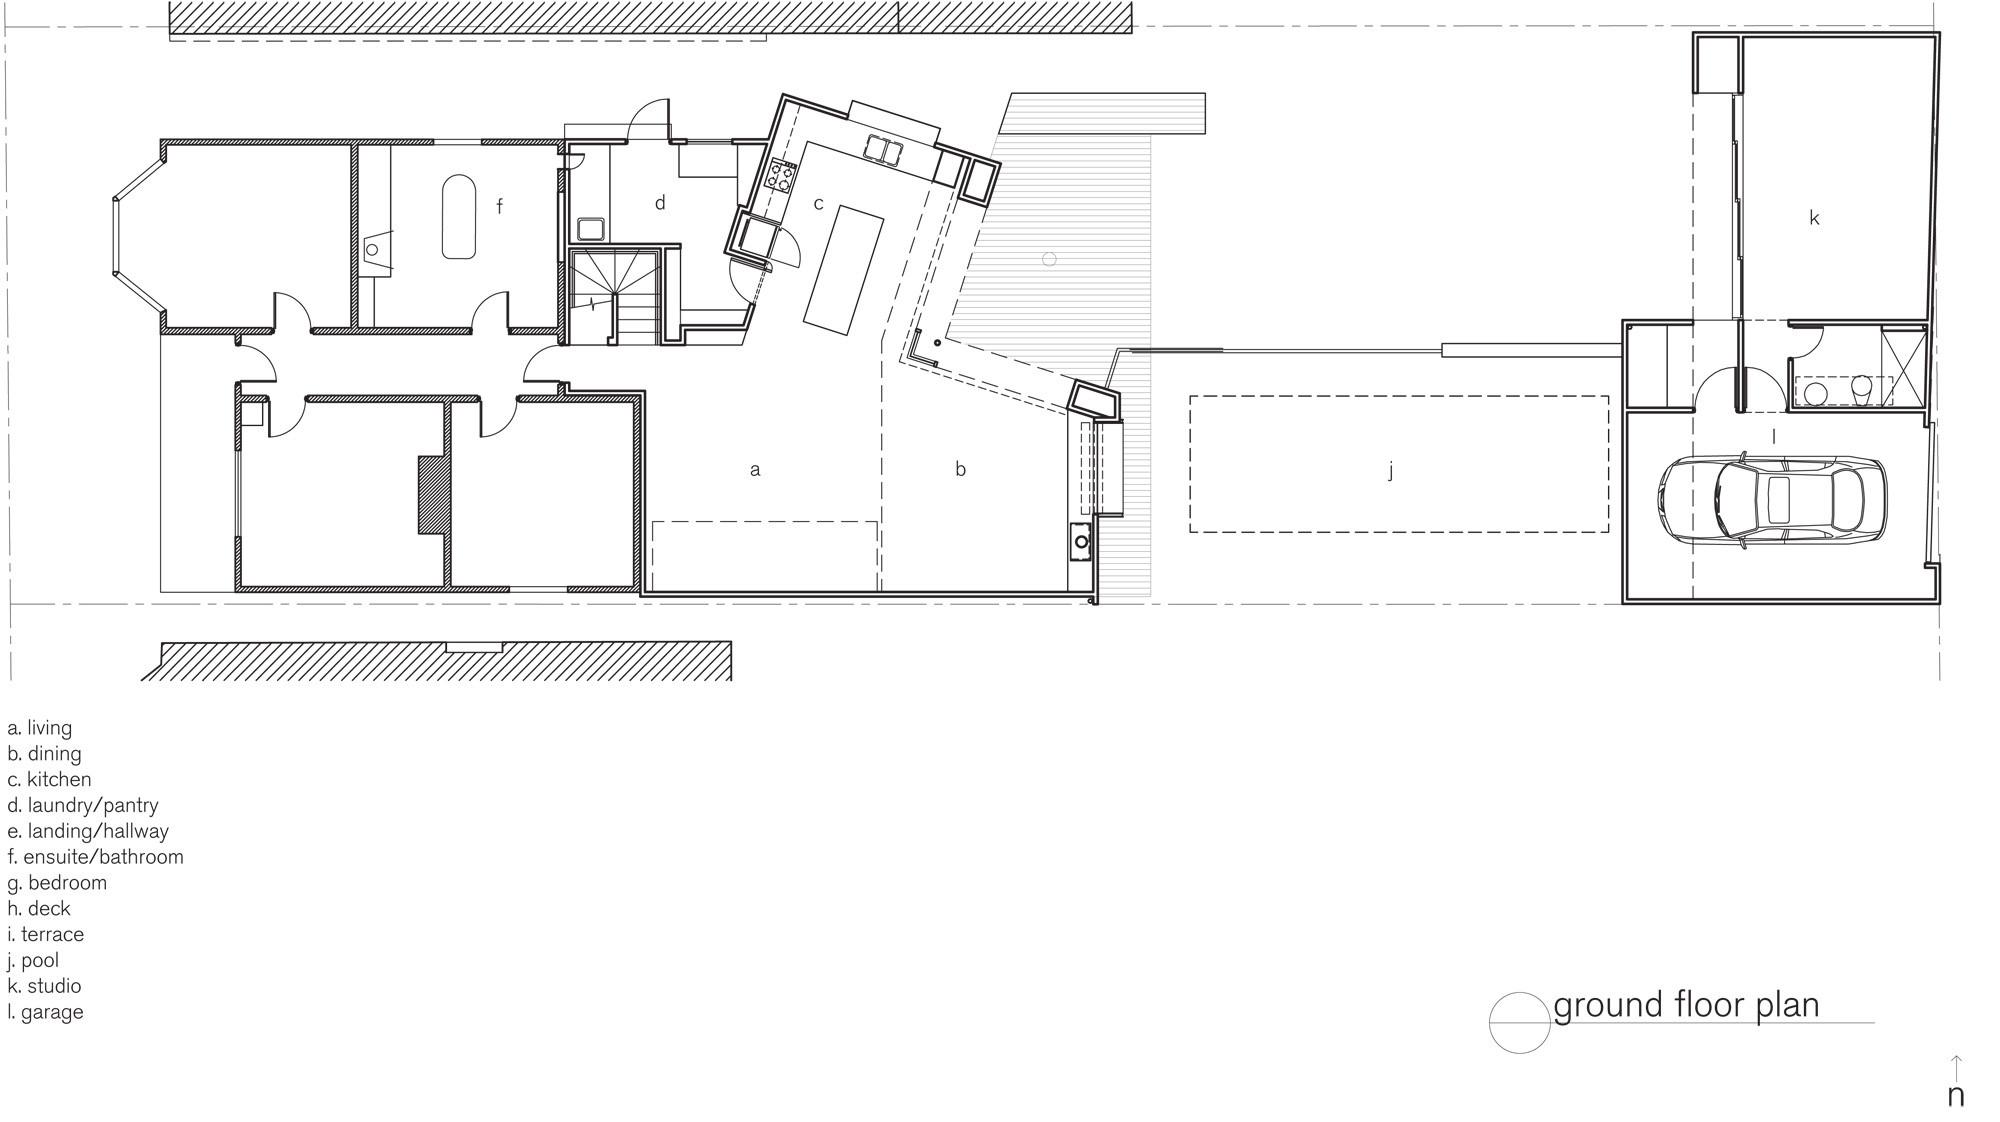 Barrow House by Andrew Maynard Architects (via Lunchbox Architect)